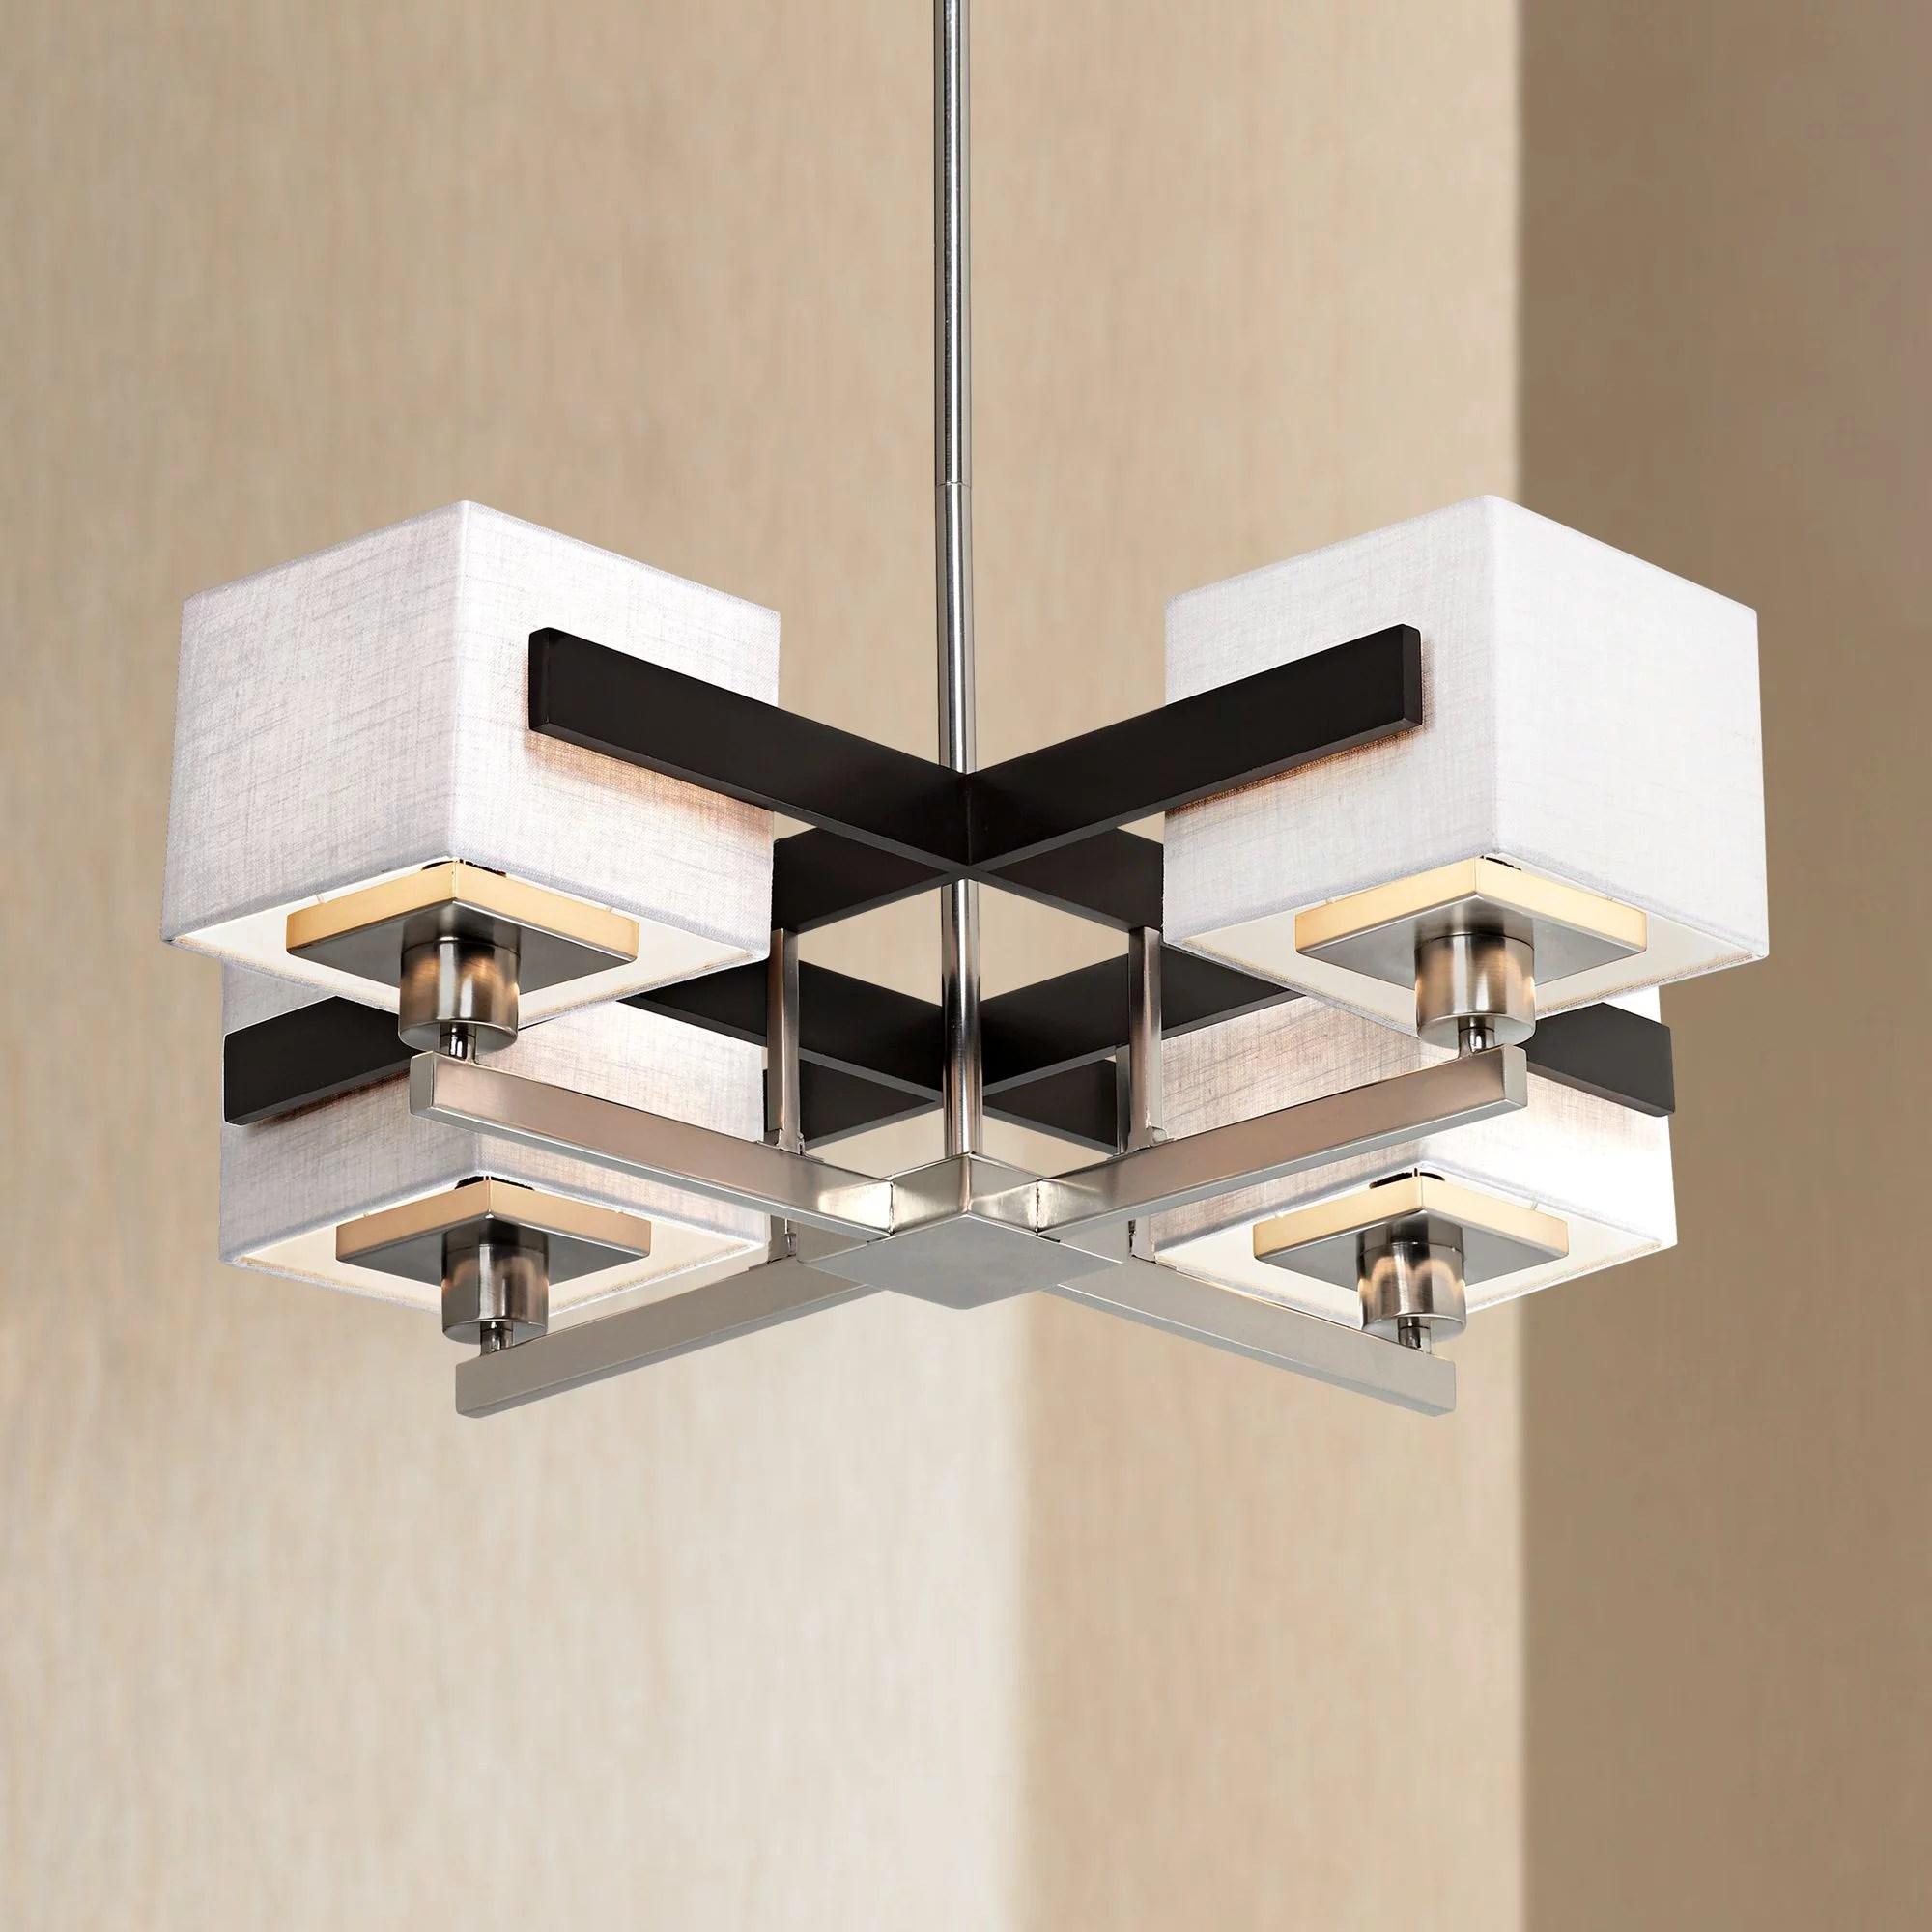 possini euro design brushed nickel pendant chandelier 28 wide modern dark mocha wood off white fabric 4 light fixture dining room walmart com